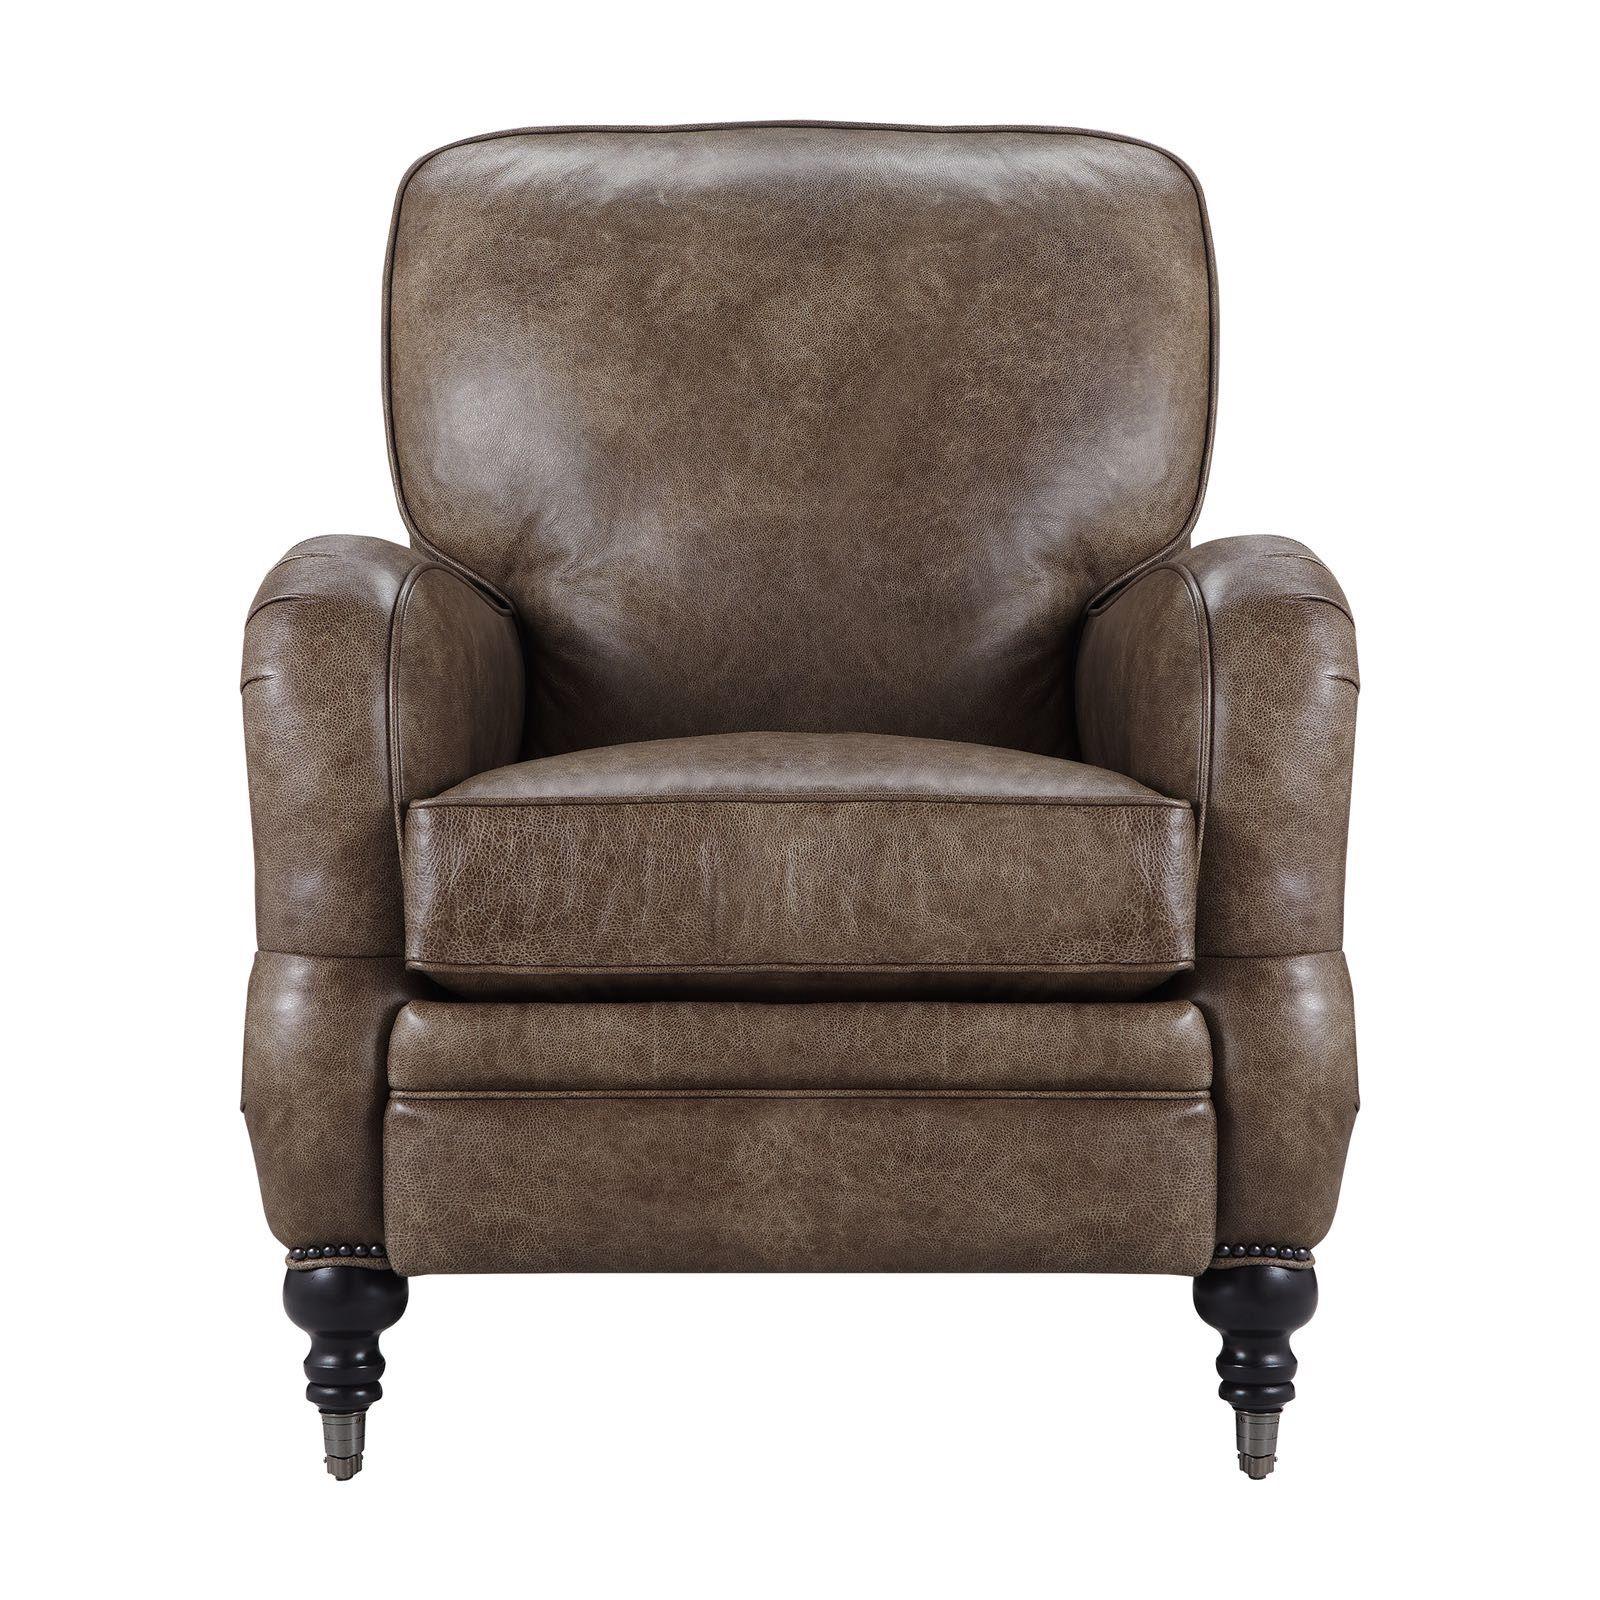 Pin by Crest Leather Ltd on Case Studies Arhaus